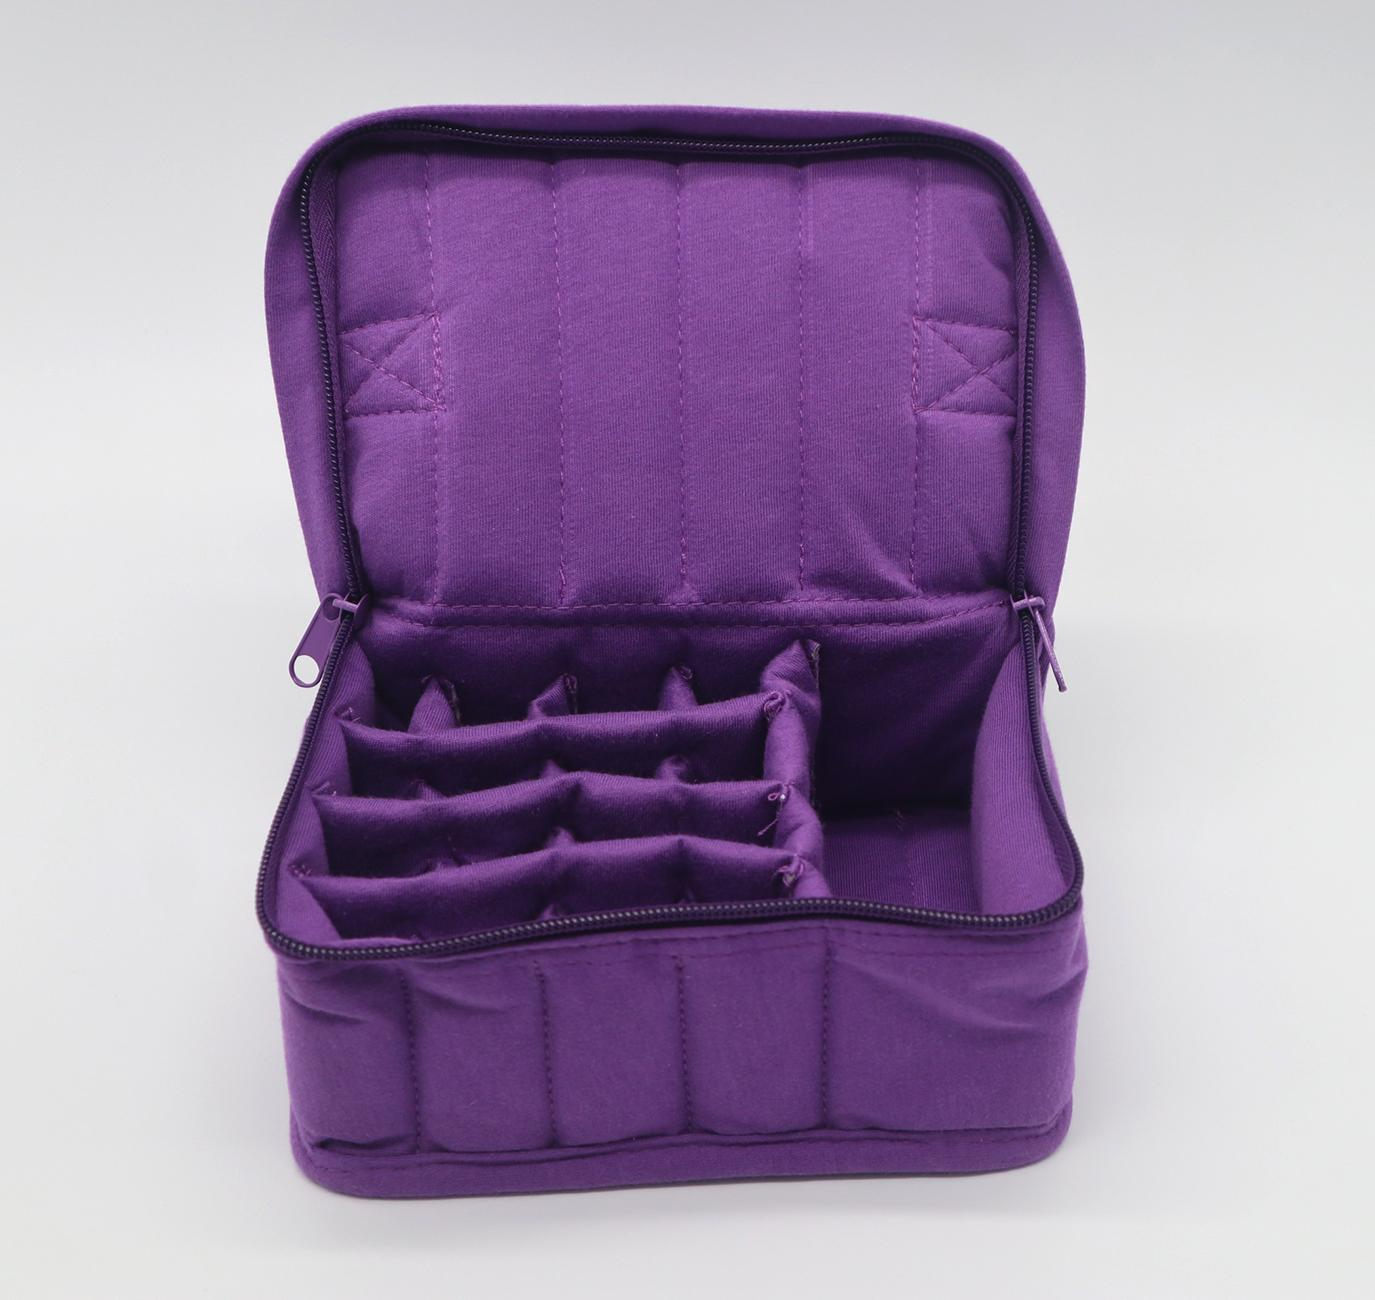 Thirteen bottles holders mutispandex made essential oil pouch bag  8